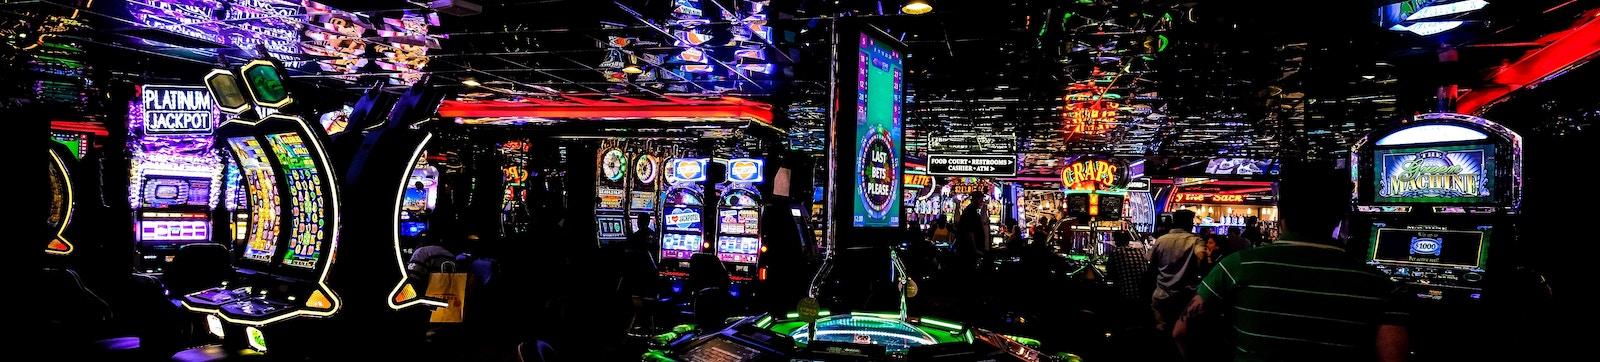 Picture of a casino floor in Las Vegas, NV